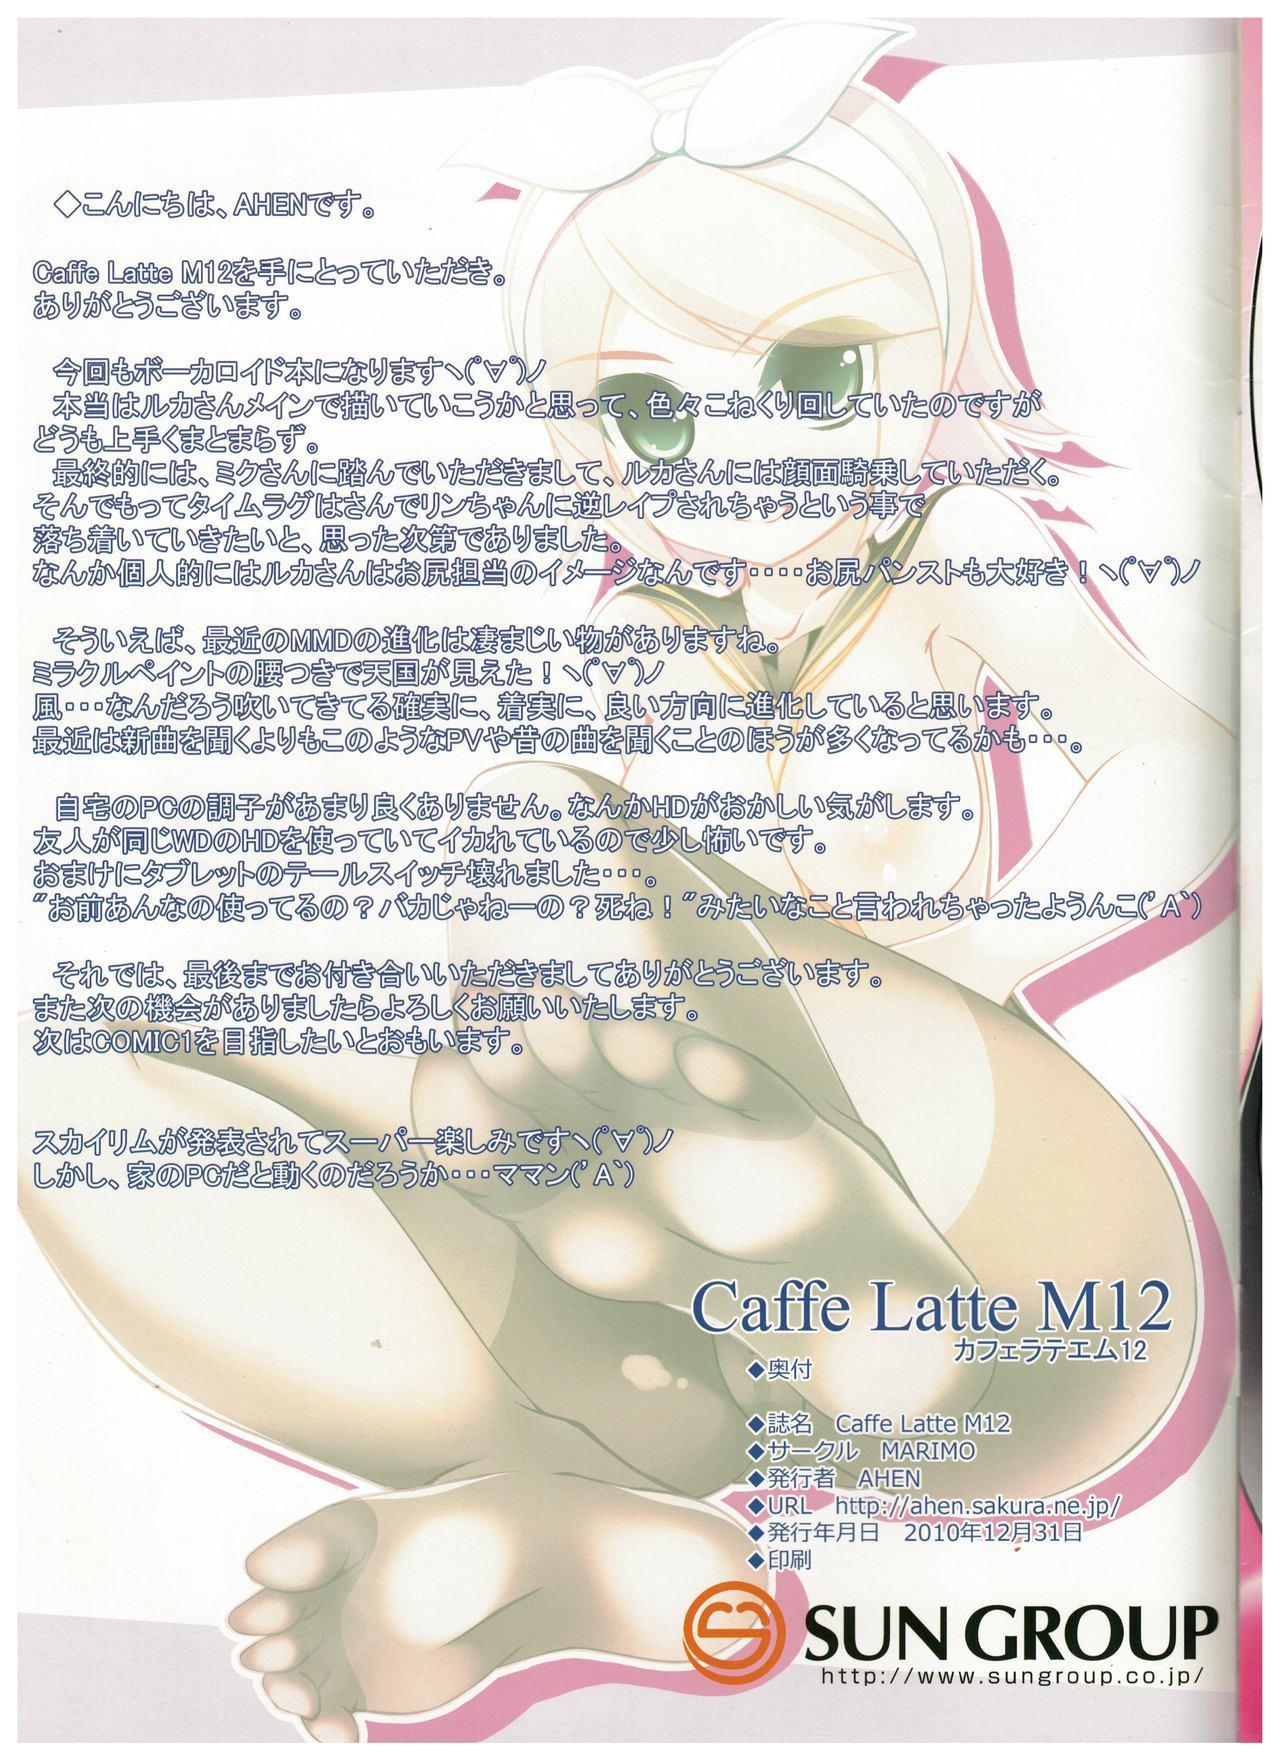 Caffe Latte M12 14